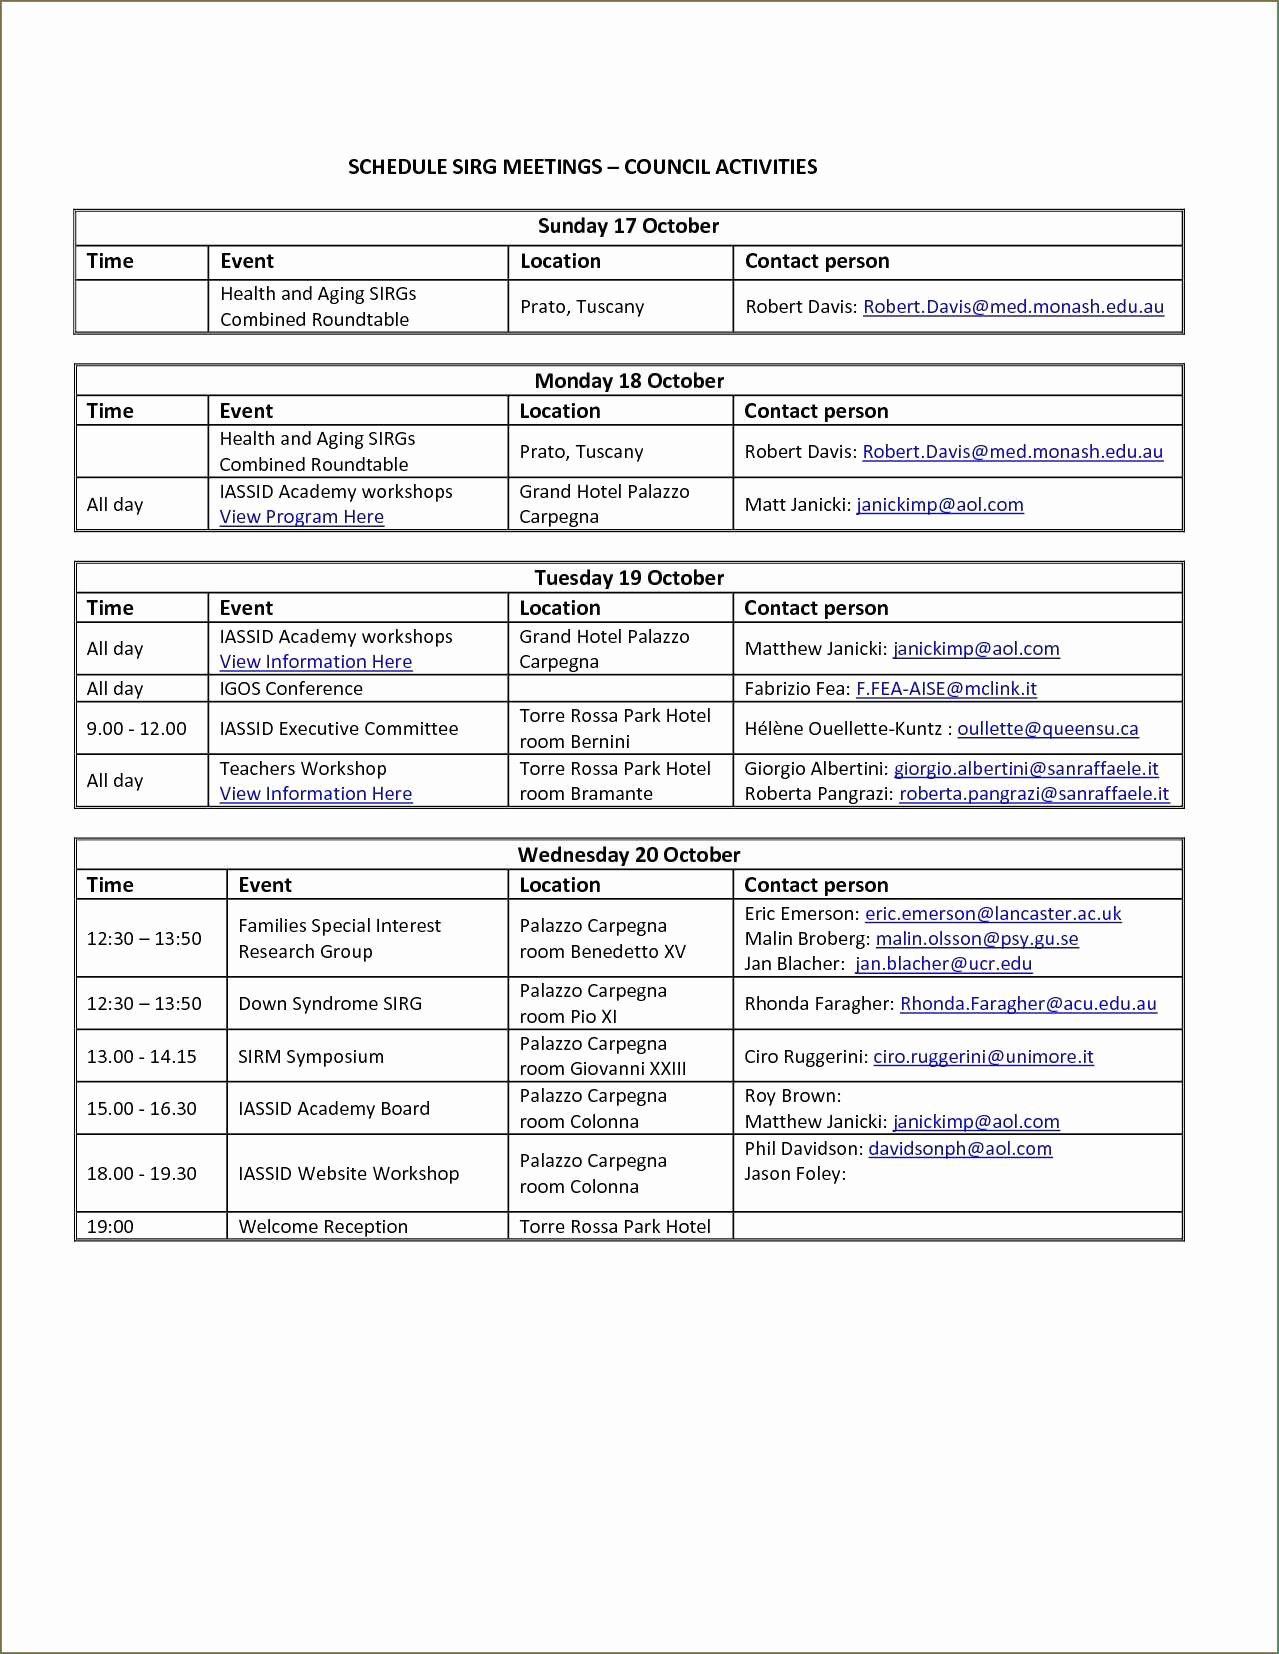 Travel Itinerary Template Google Docs Inspirational Travel Itinerary Template Google Docs New Itinerary